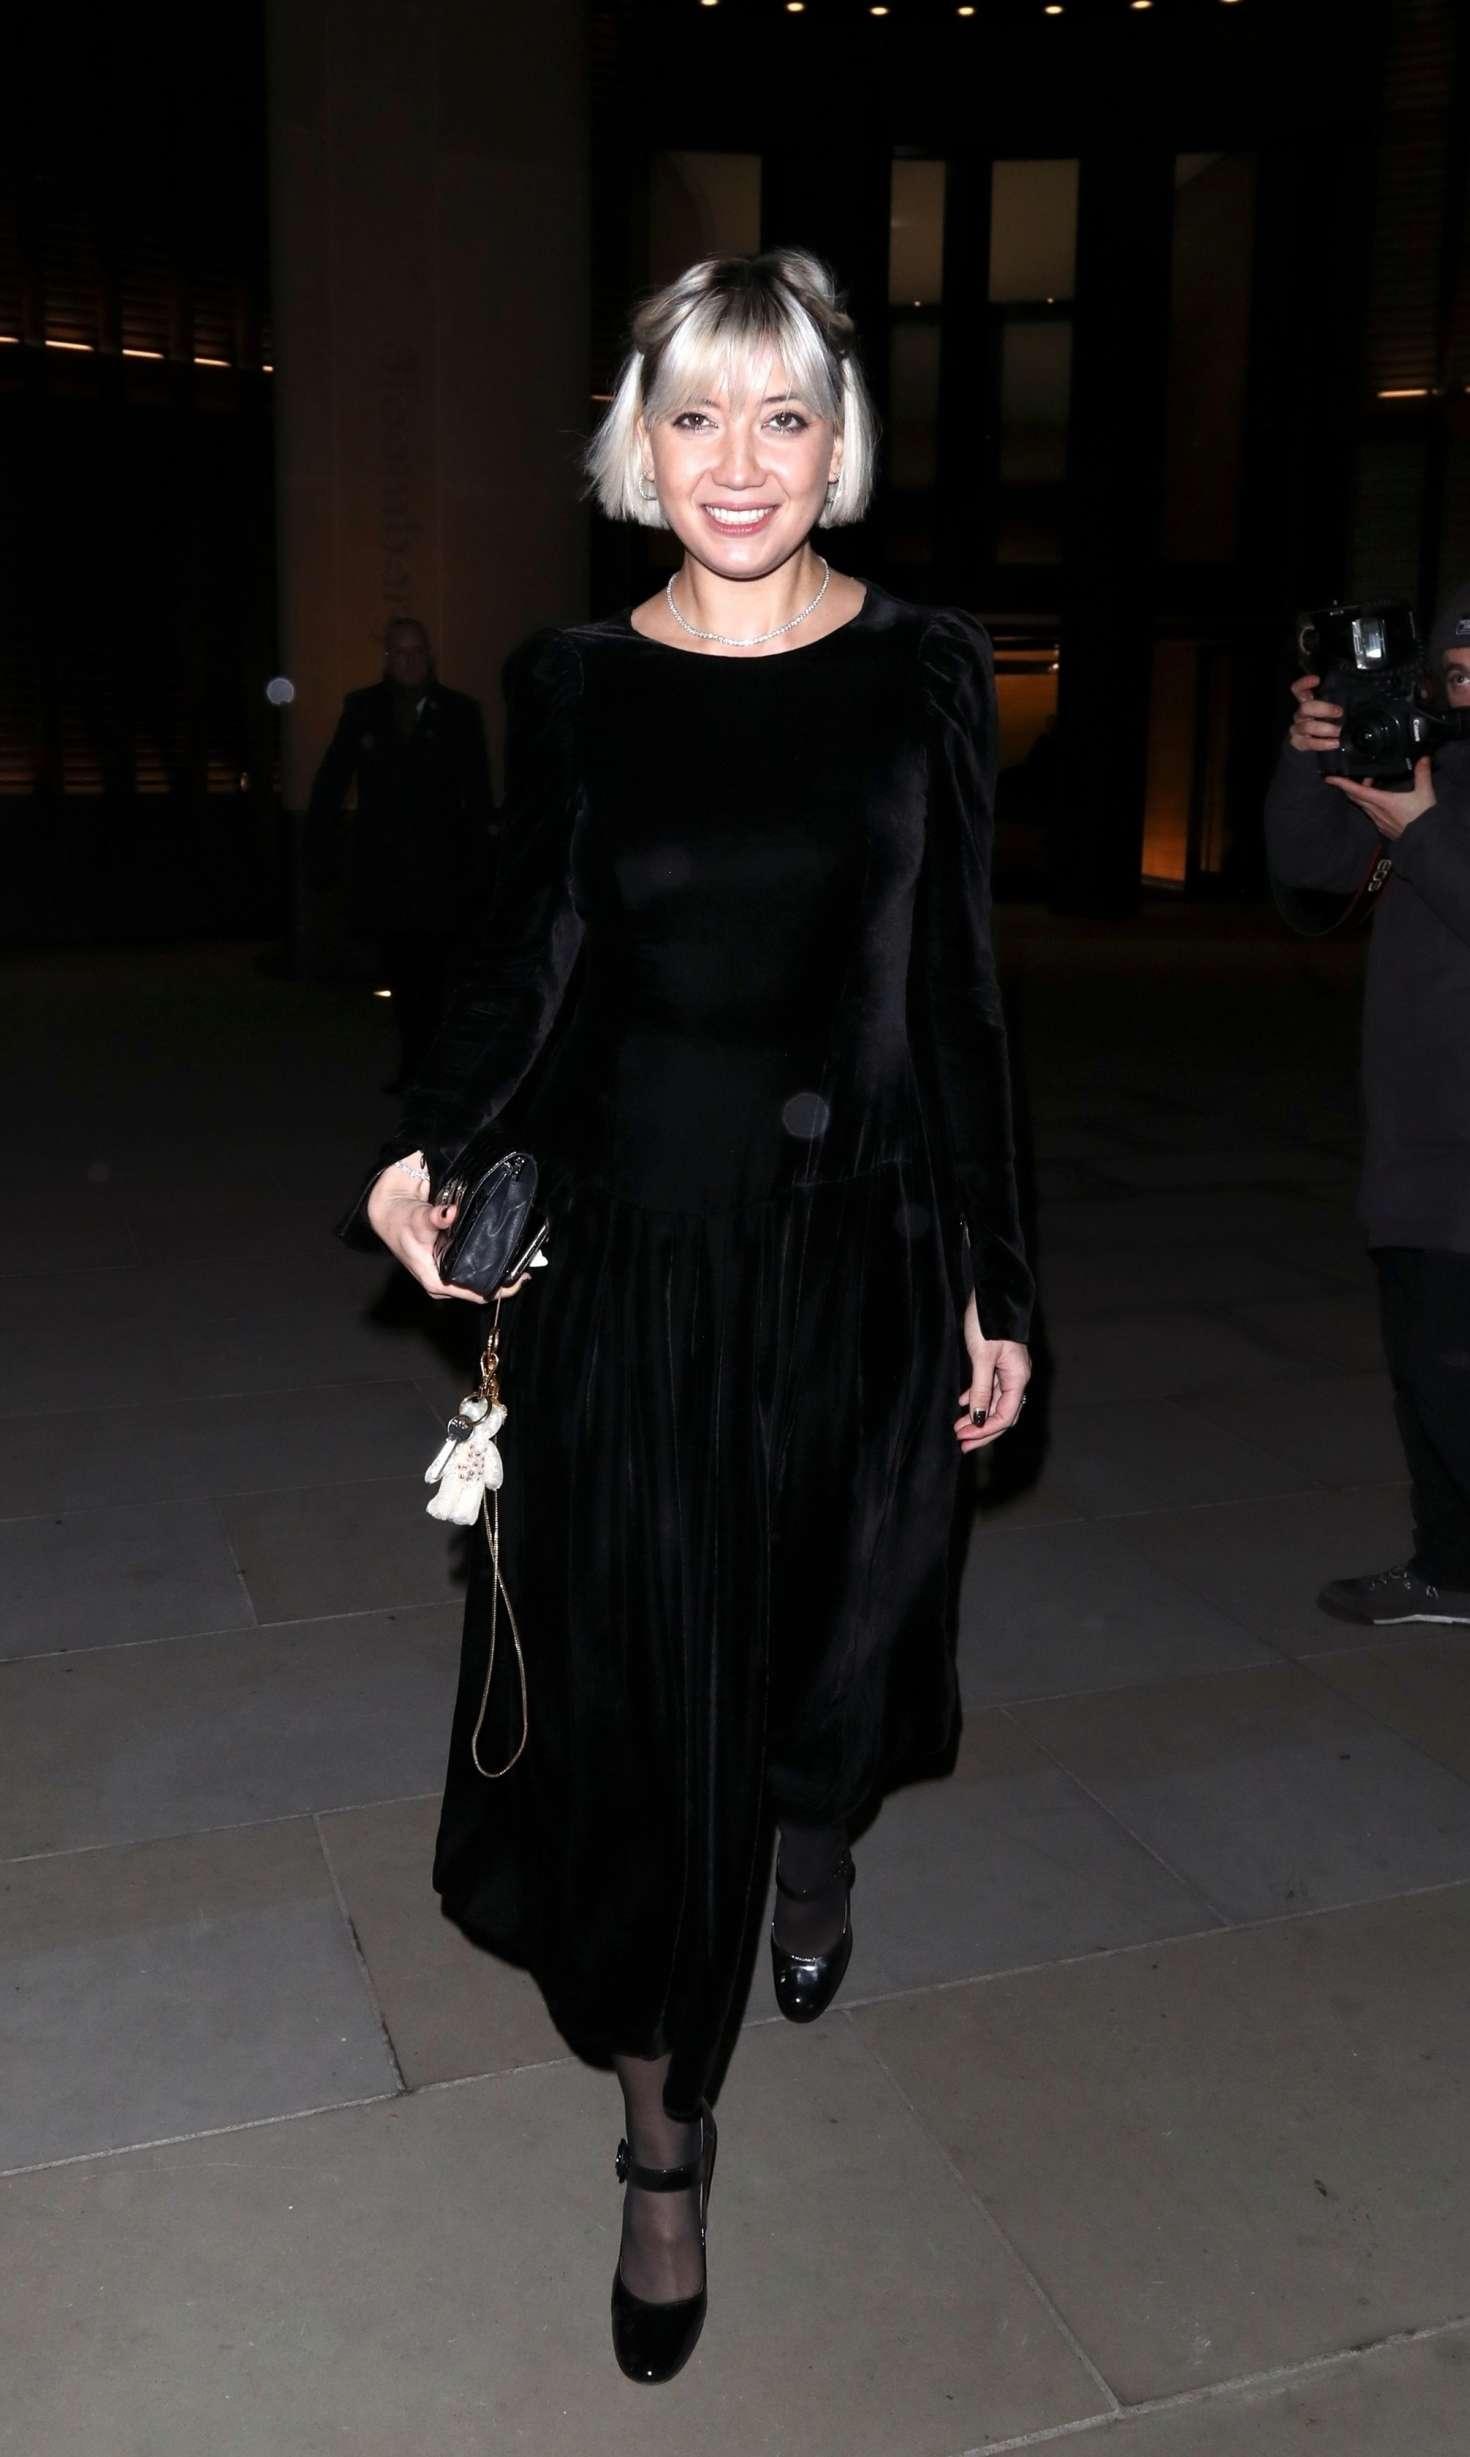 Daisy Lowe 2018 : Daisy Lowe: Vanity Fair x Bloomberg Climate Change Gala Dinner -01